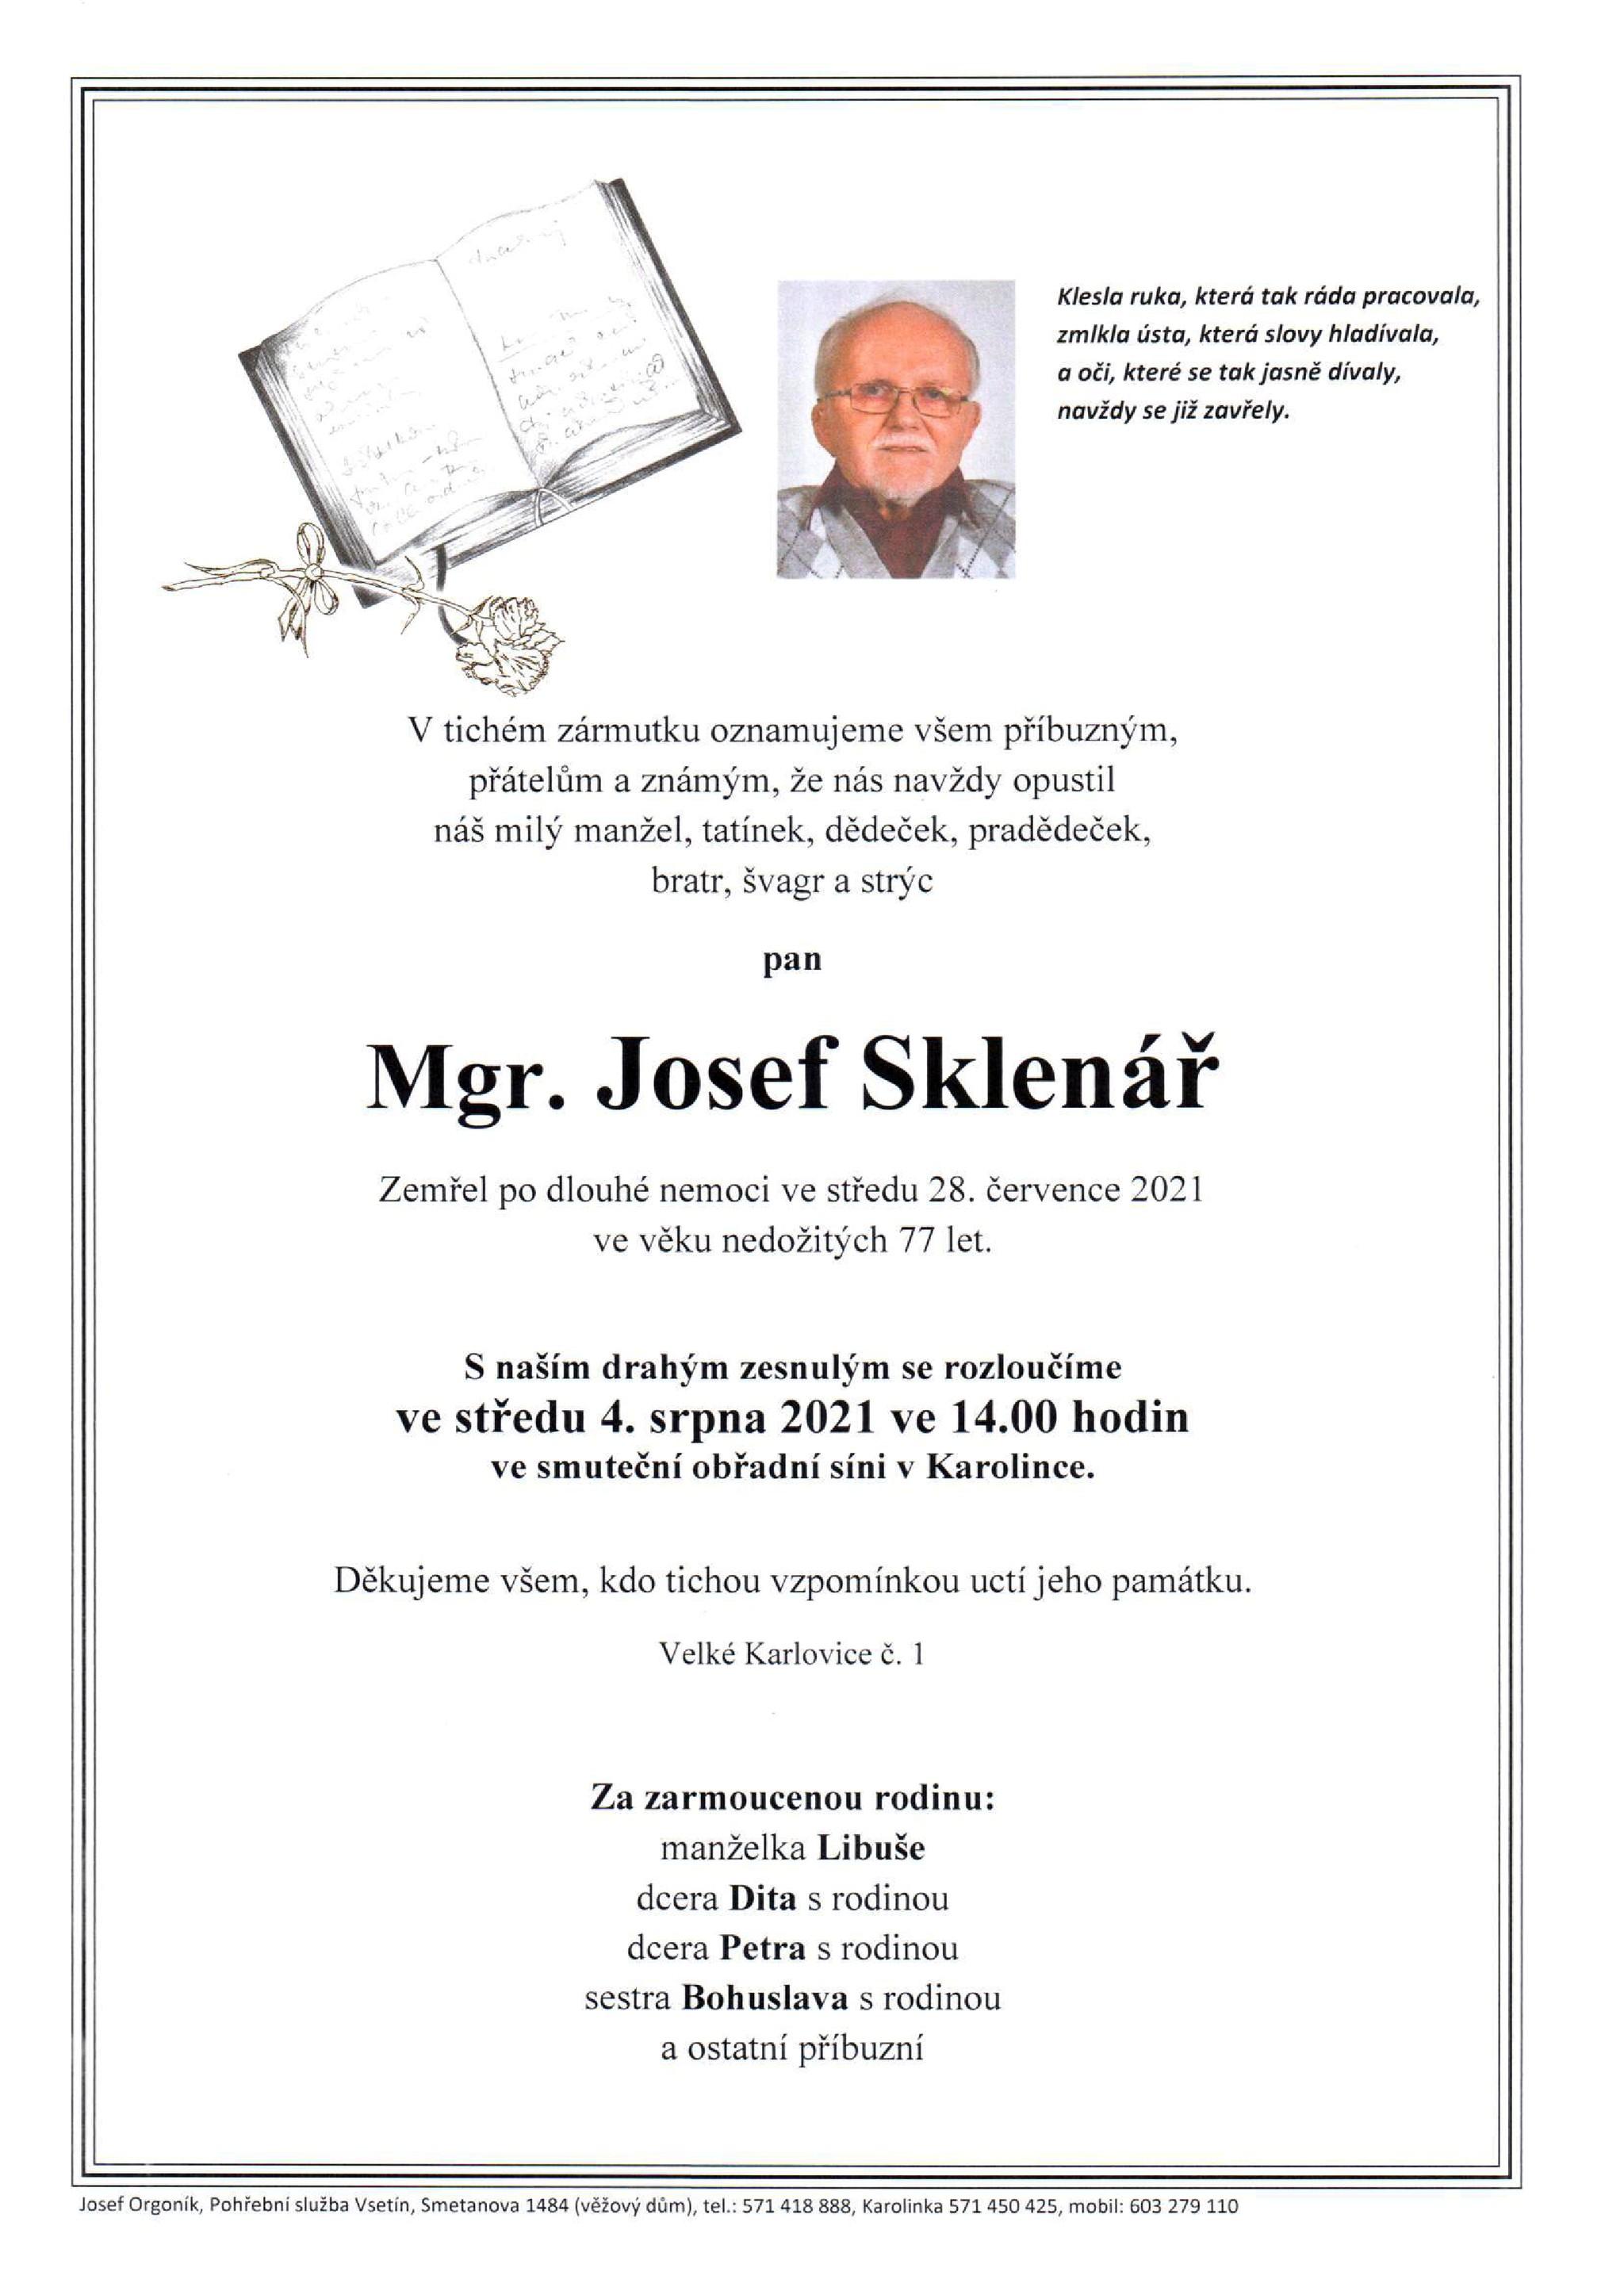 Mgr. Josef Sklenář